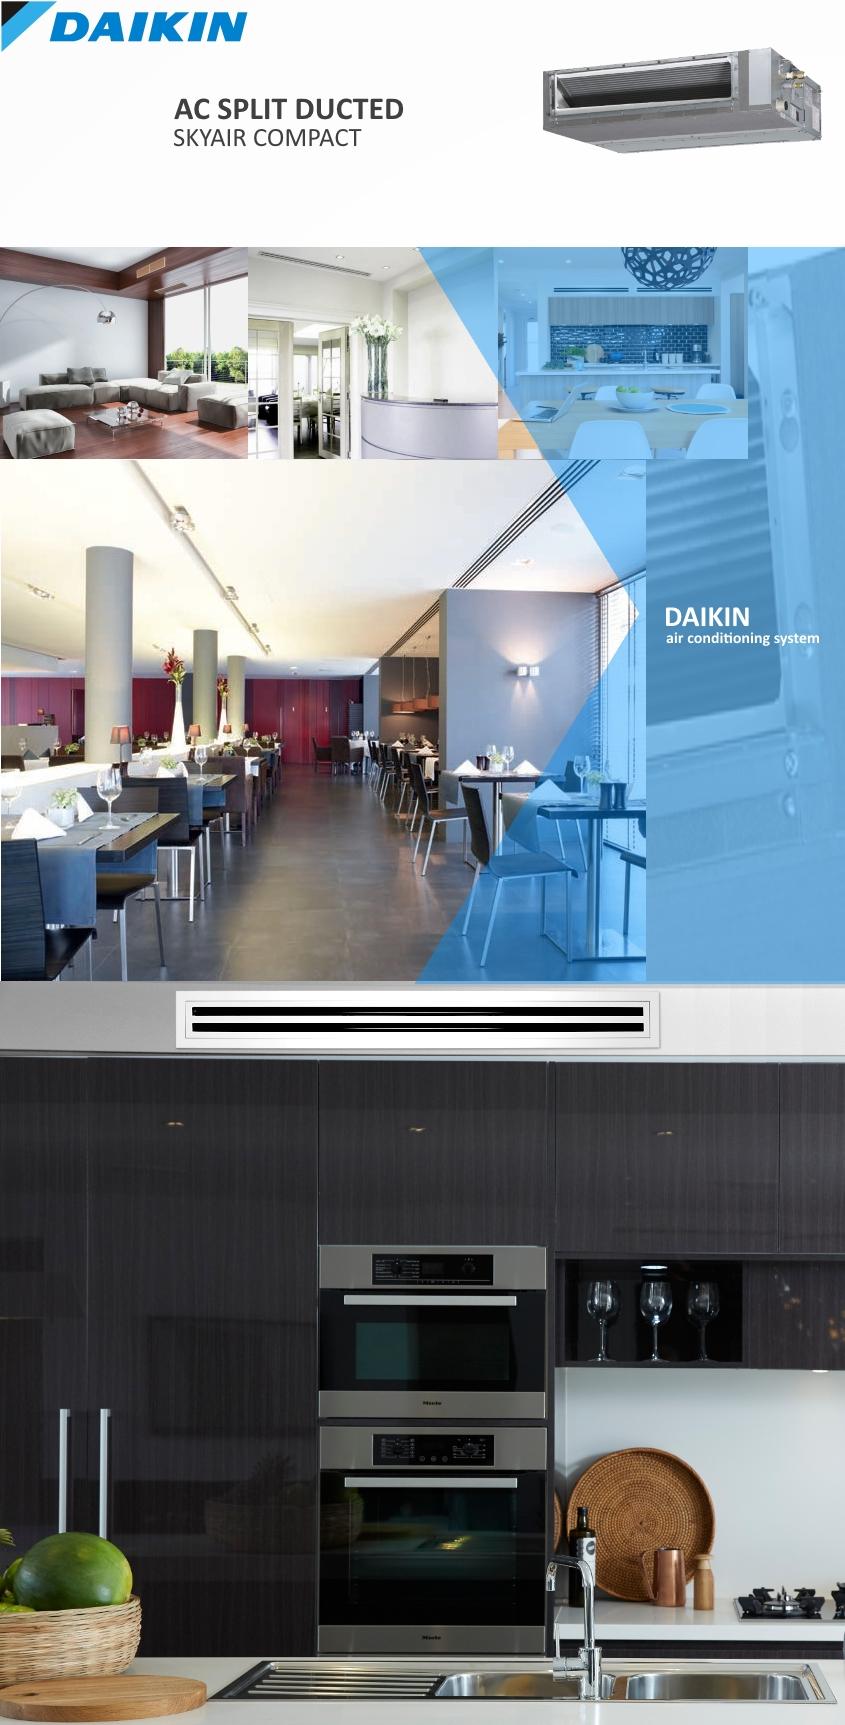 AC Split Duct Daikin - BANNER - pict install